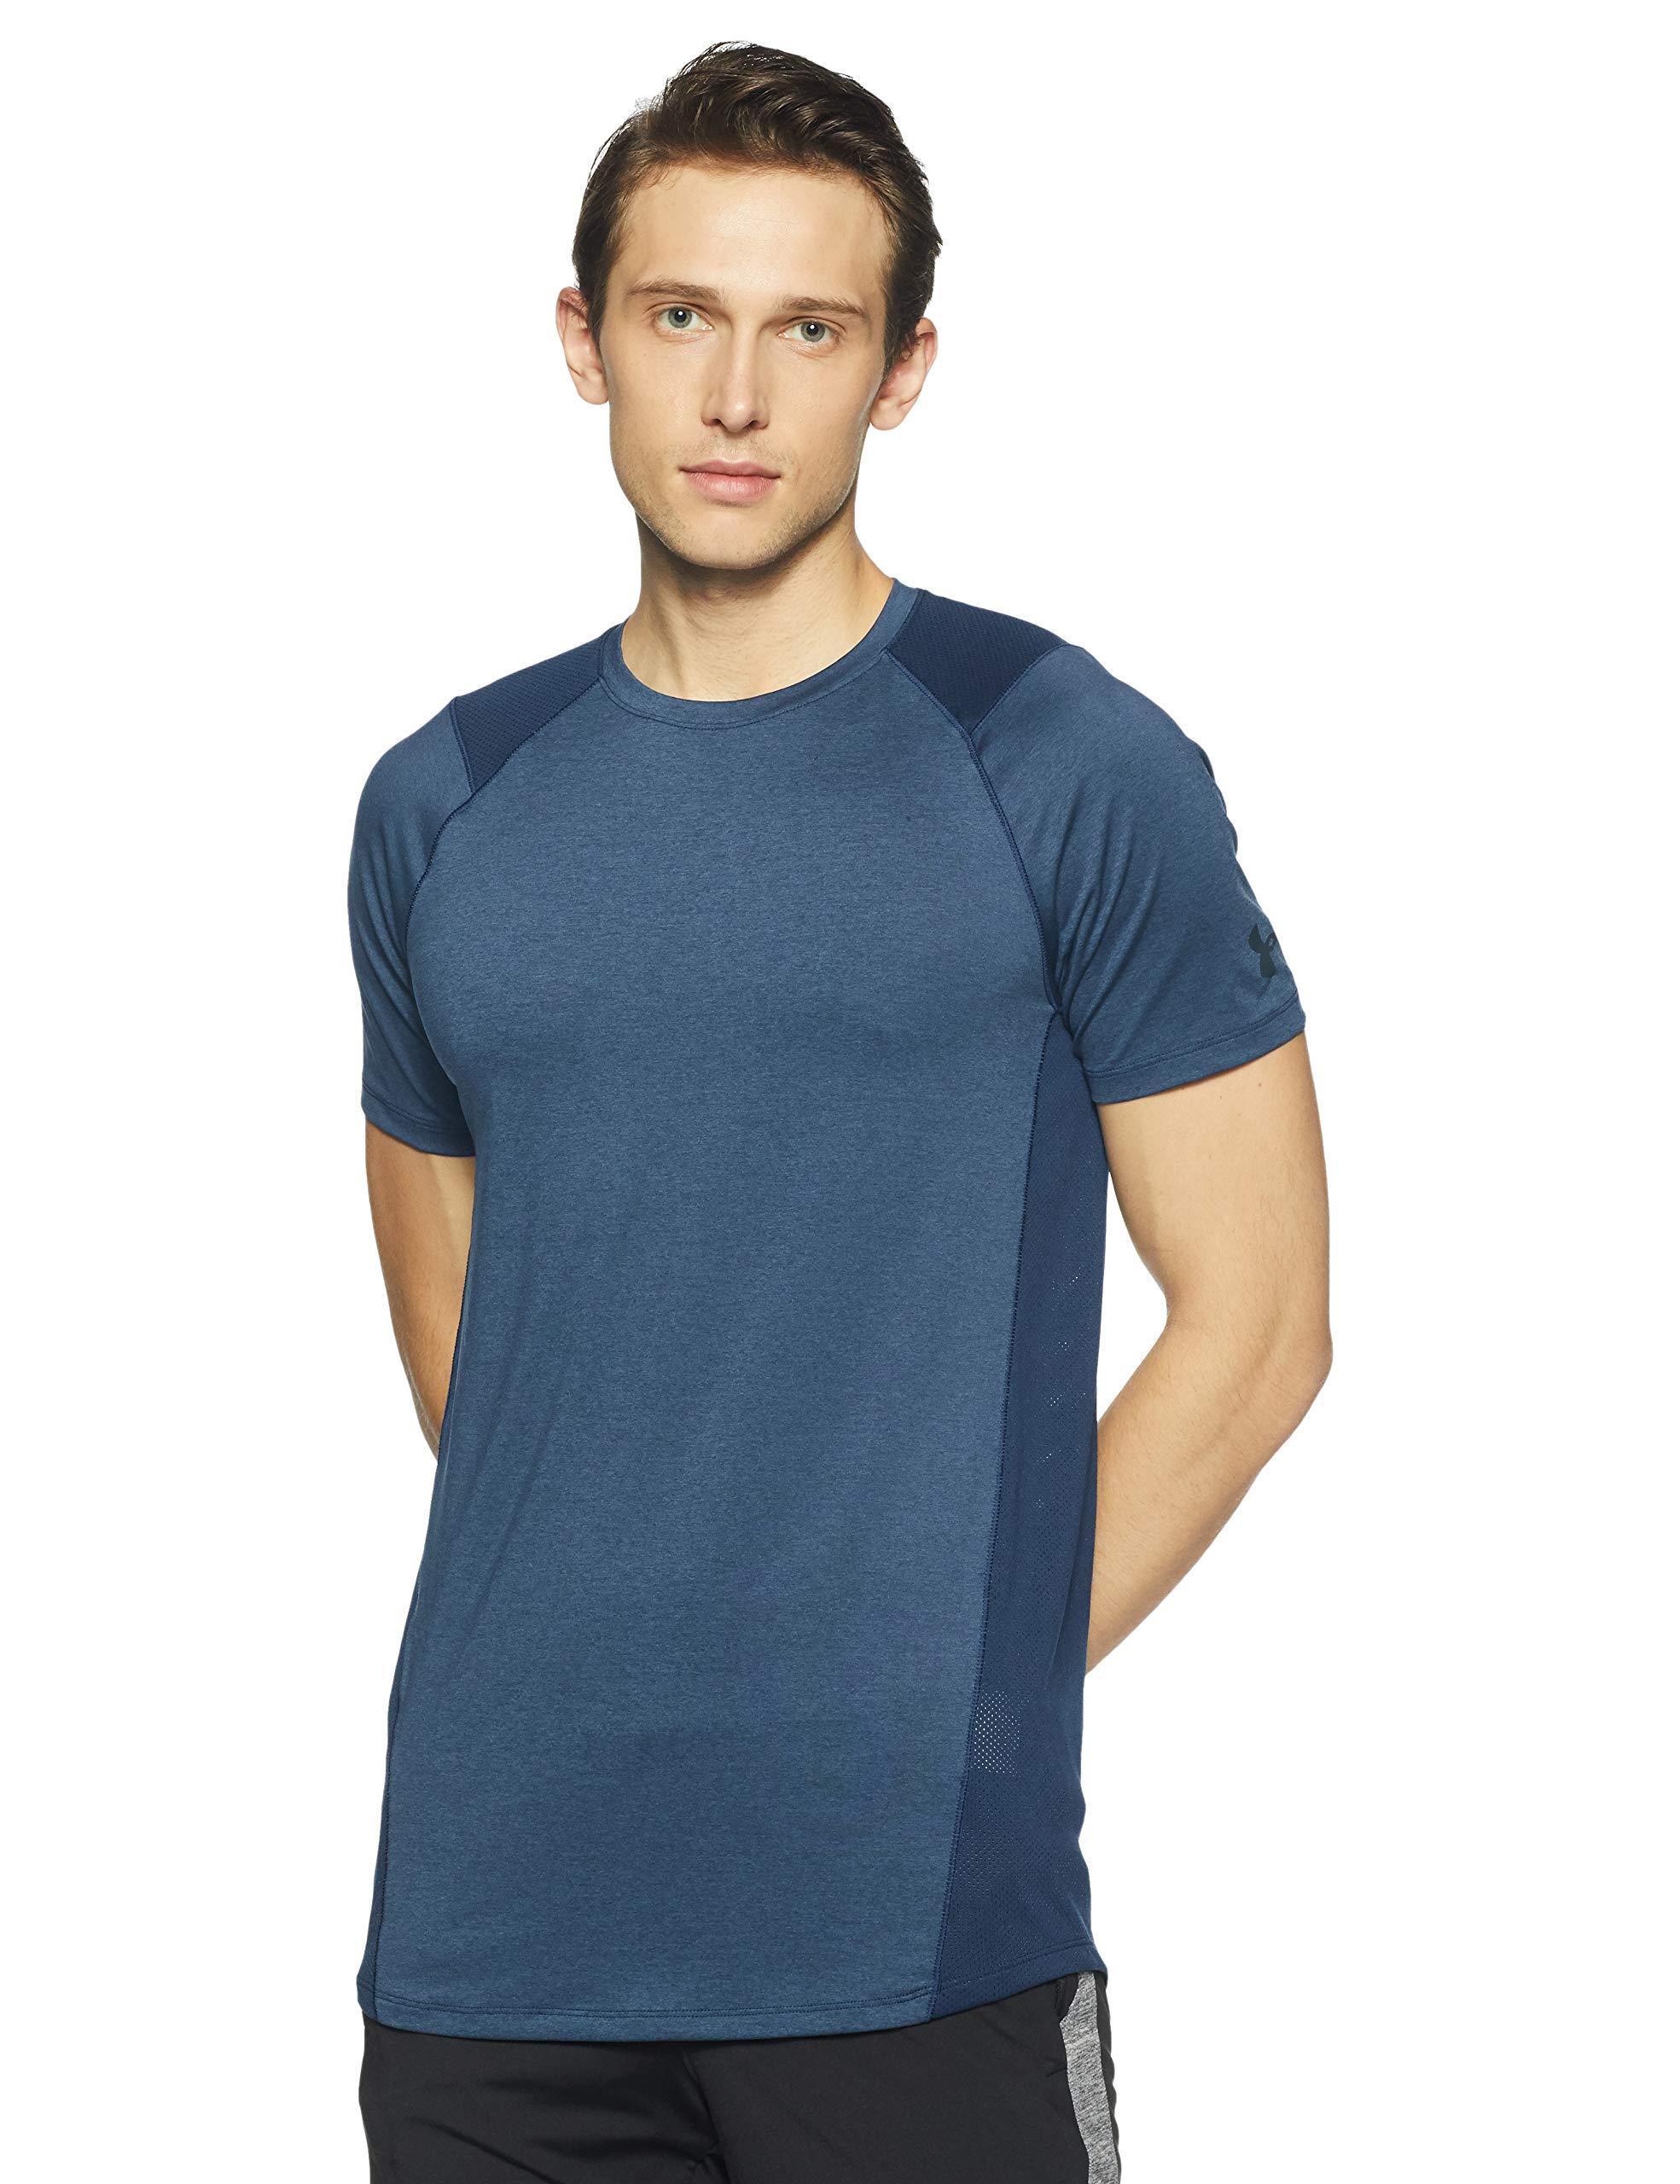 Under Armour Men's MK-1 Short Sleeve Shirt, Academy (408)/Stealth Gray, X-Small